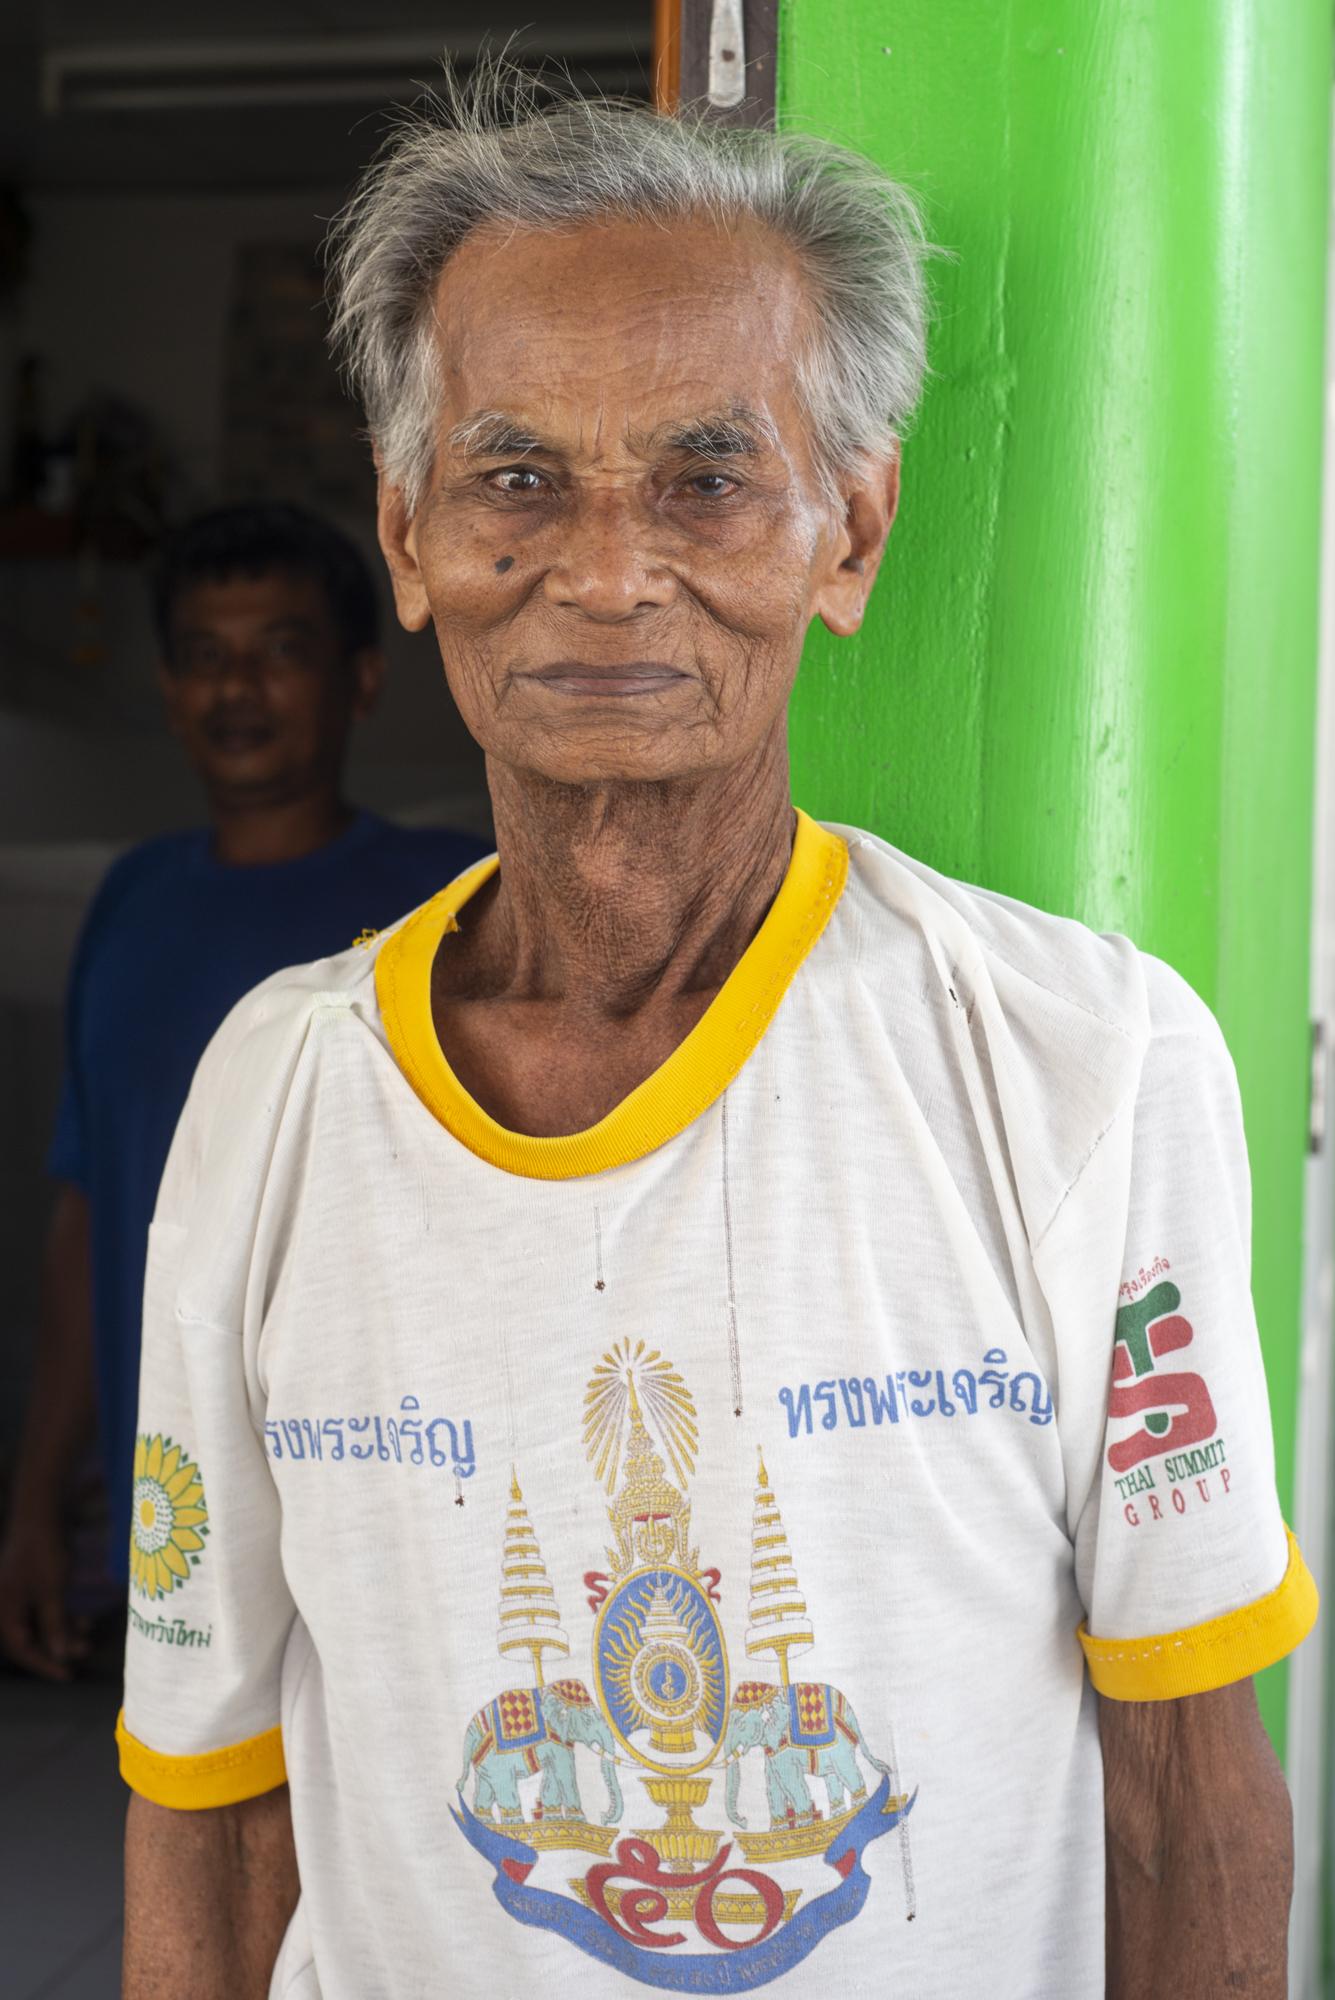 Thailand0419-2903.jpg